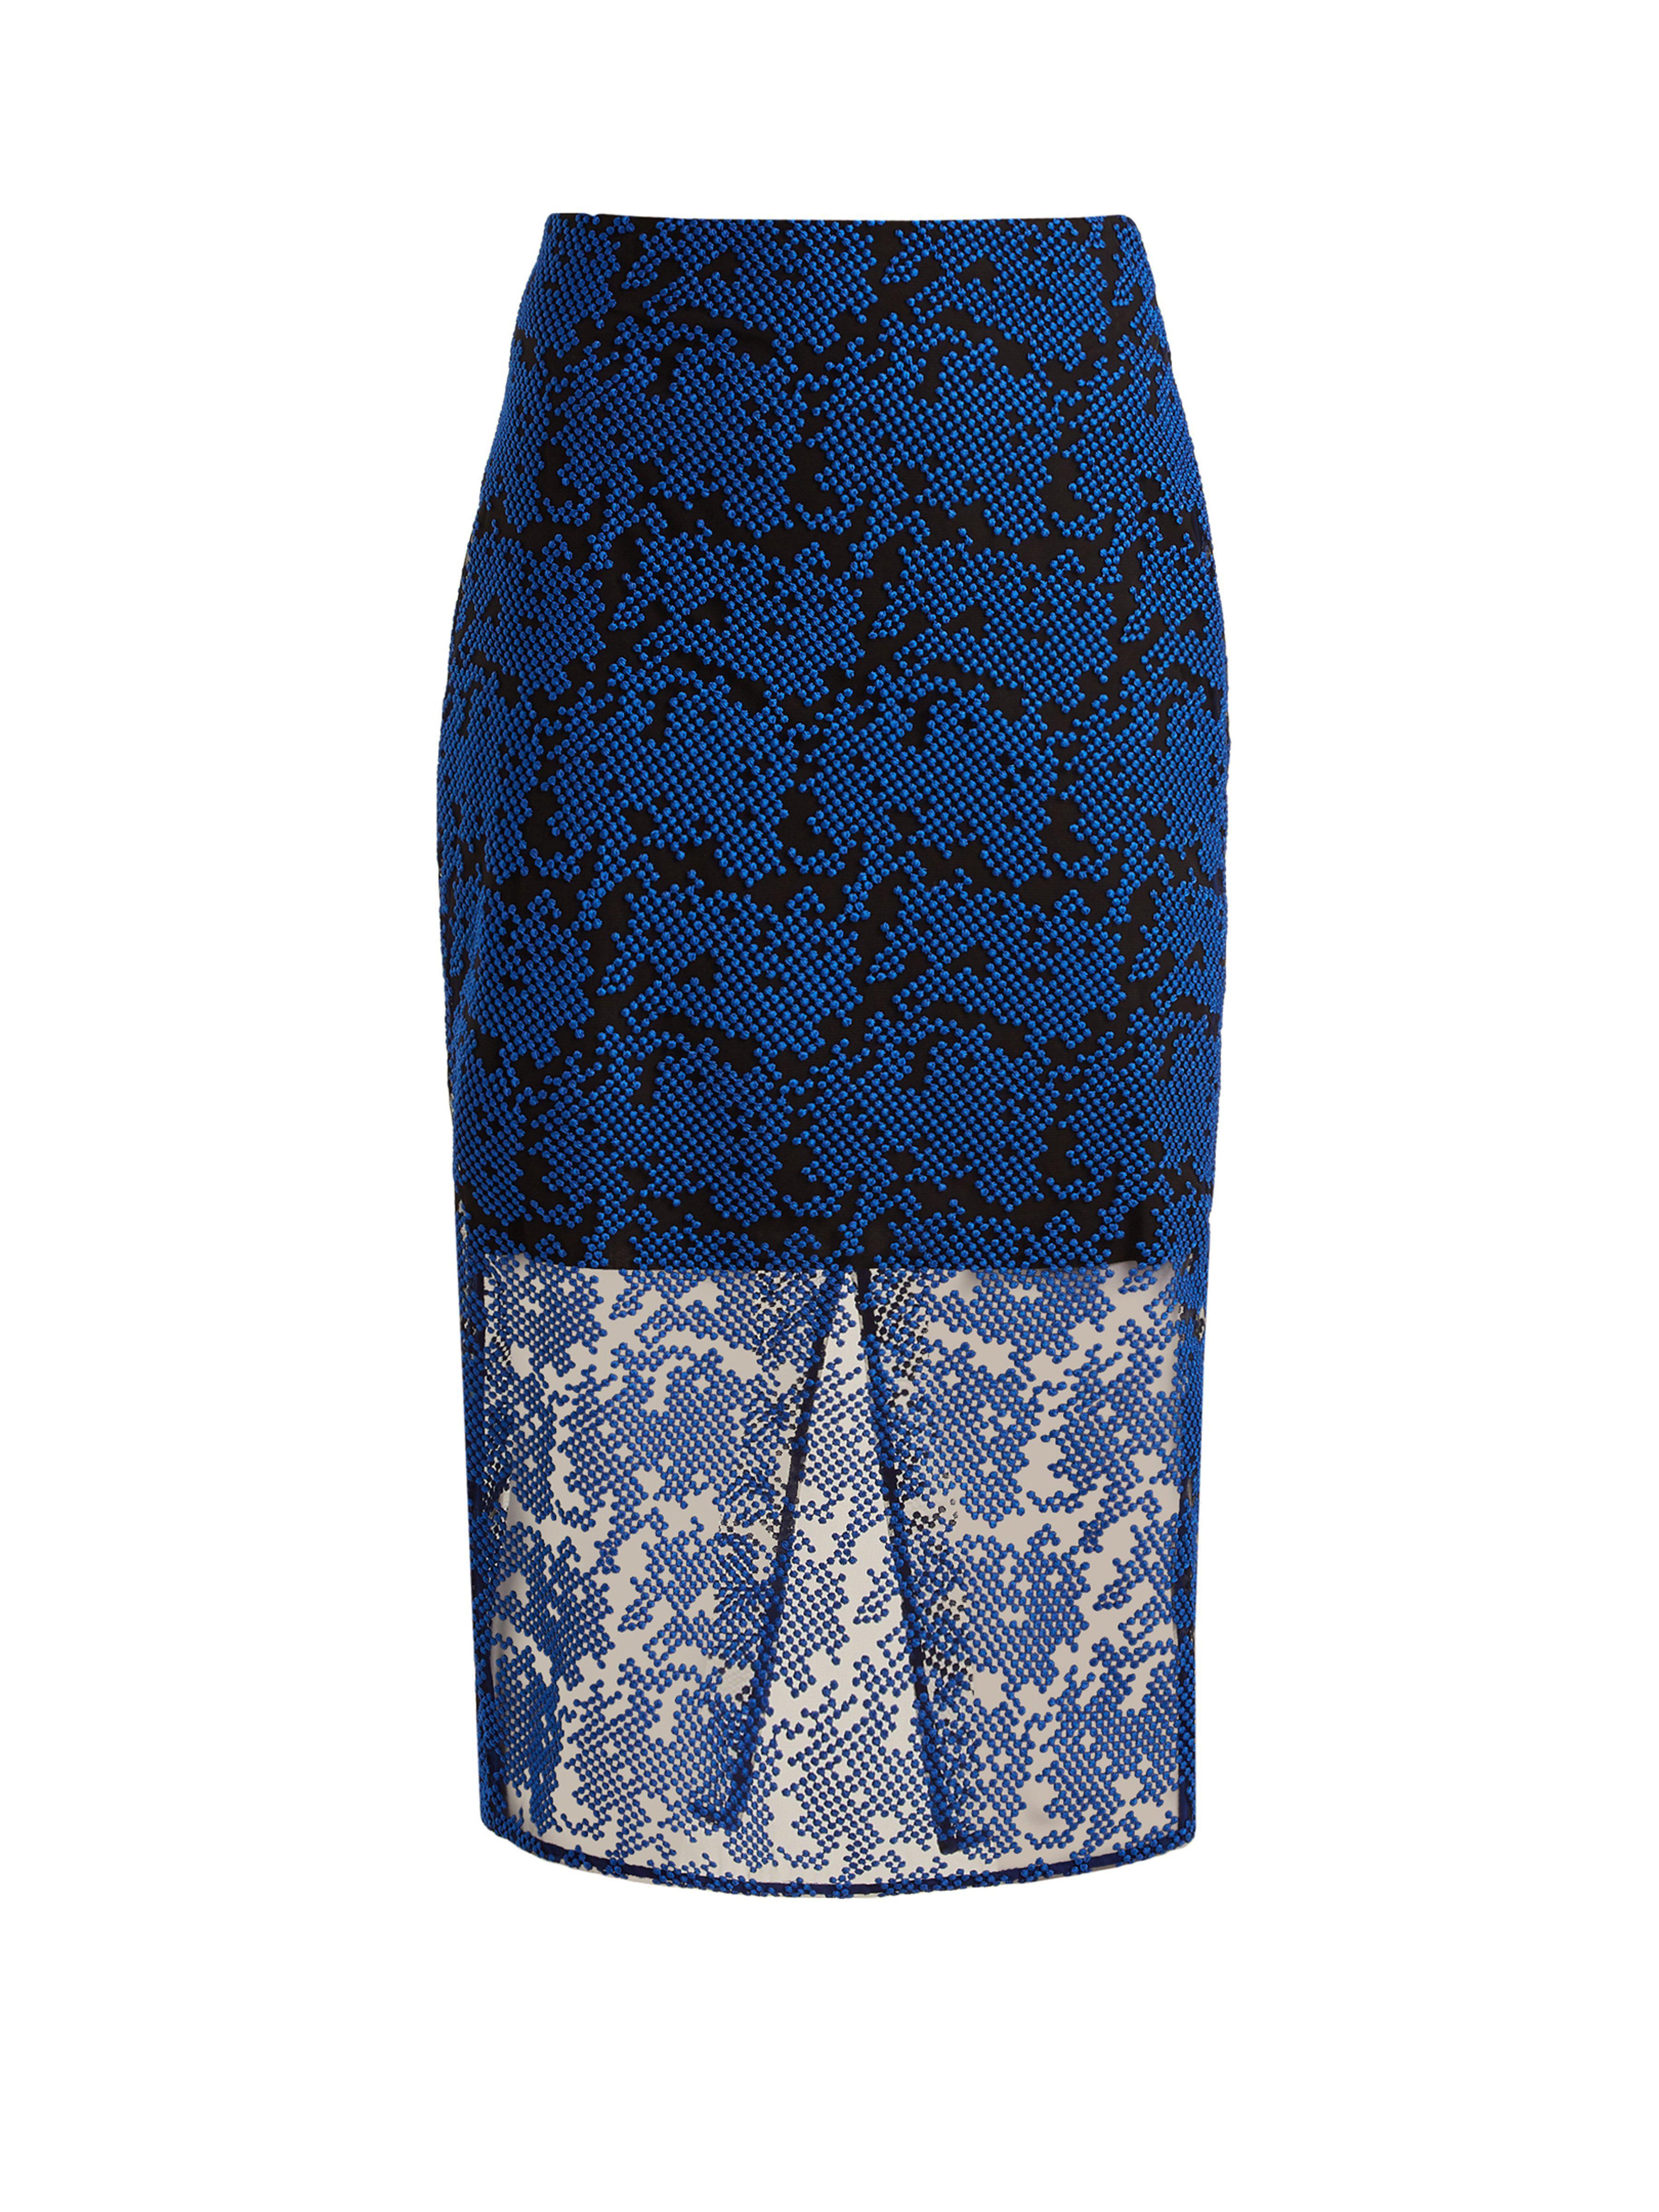 8f0de8e86 Diane von Furstenberg. Women's Blue Geometric Embroidered Tulle Pencil Skirt